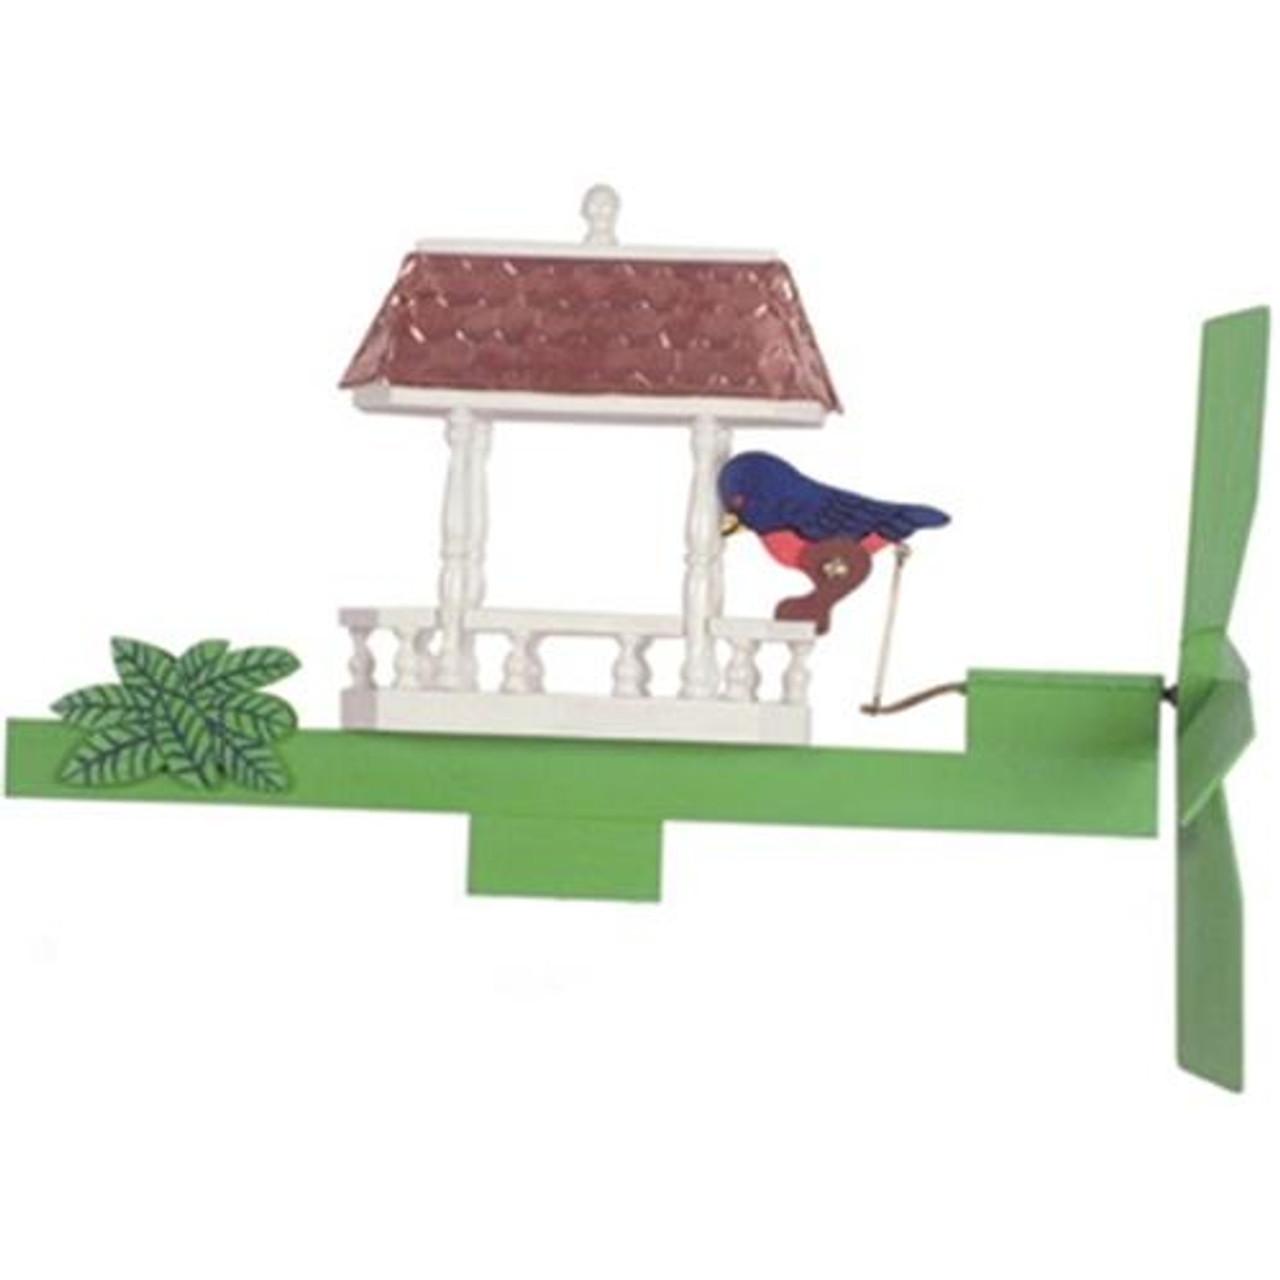 Cherry Tree Toys Windward Feeder Whirligig Plan